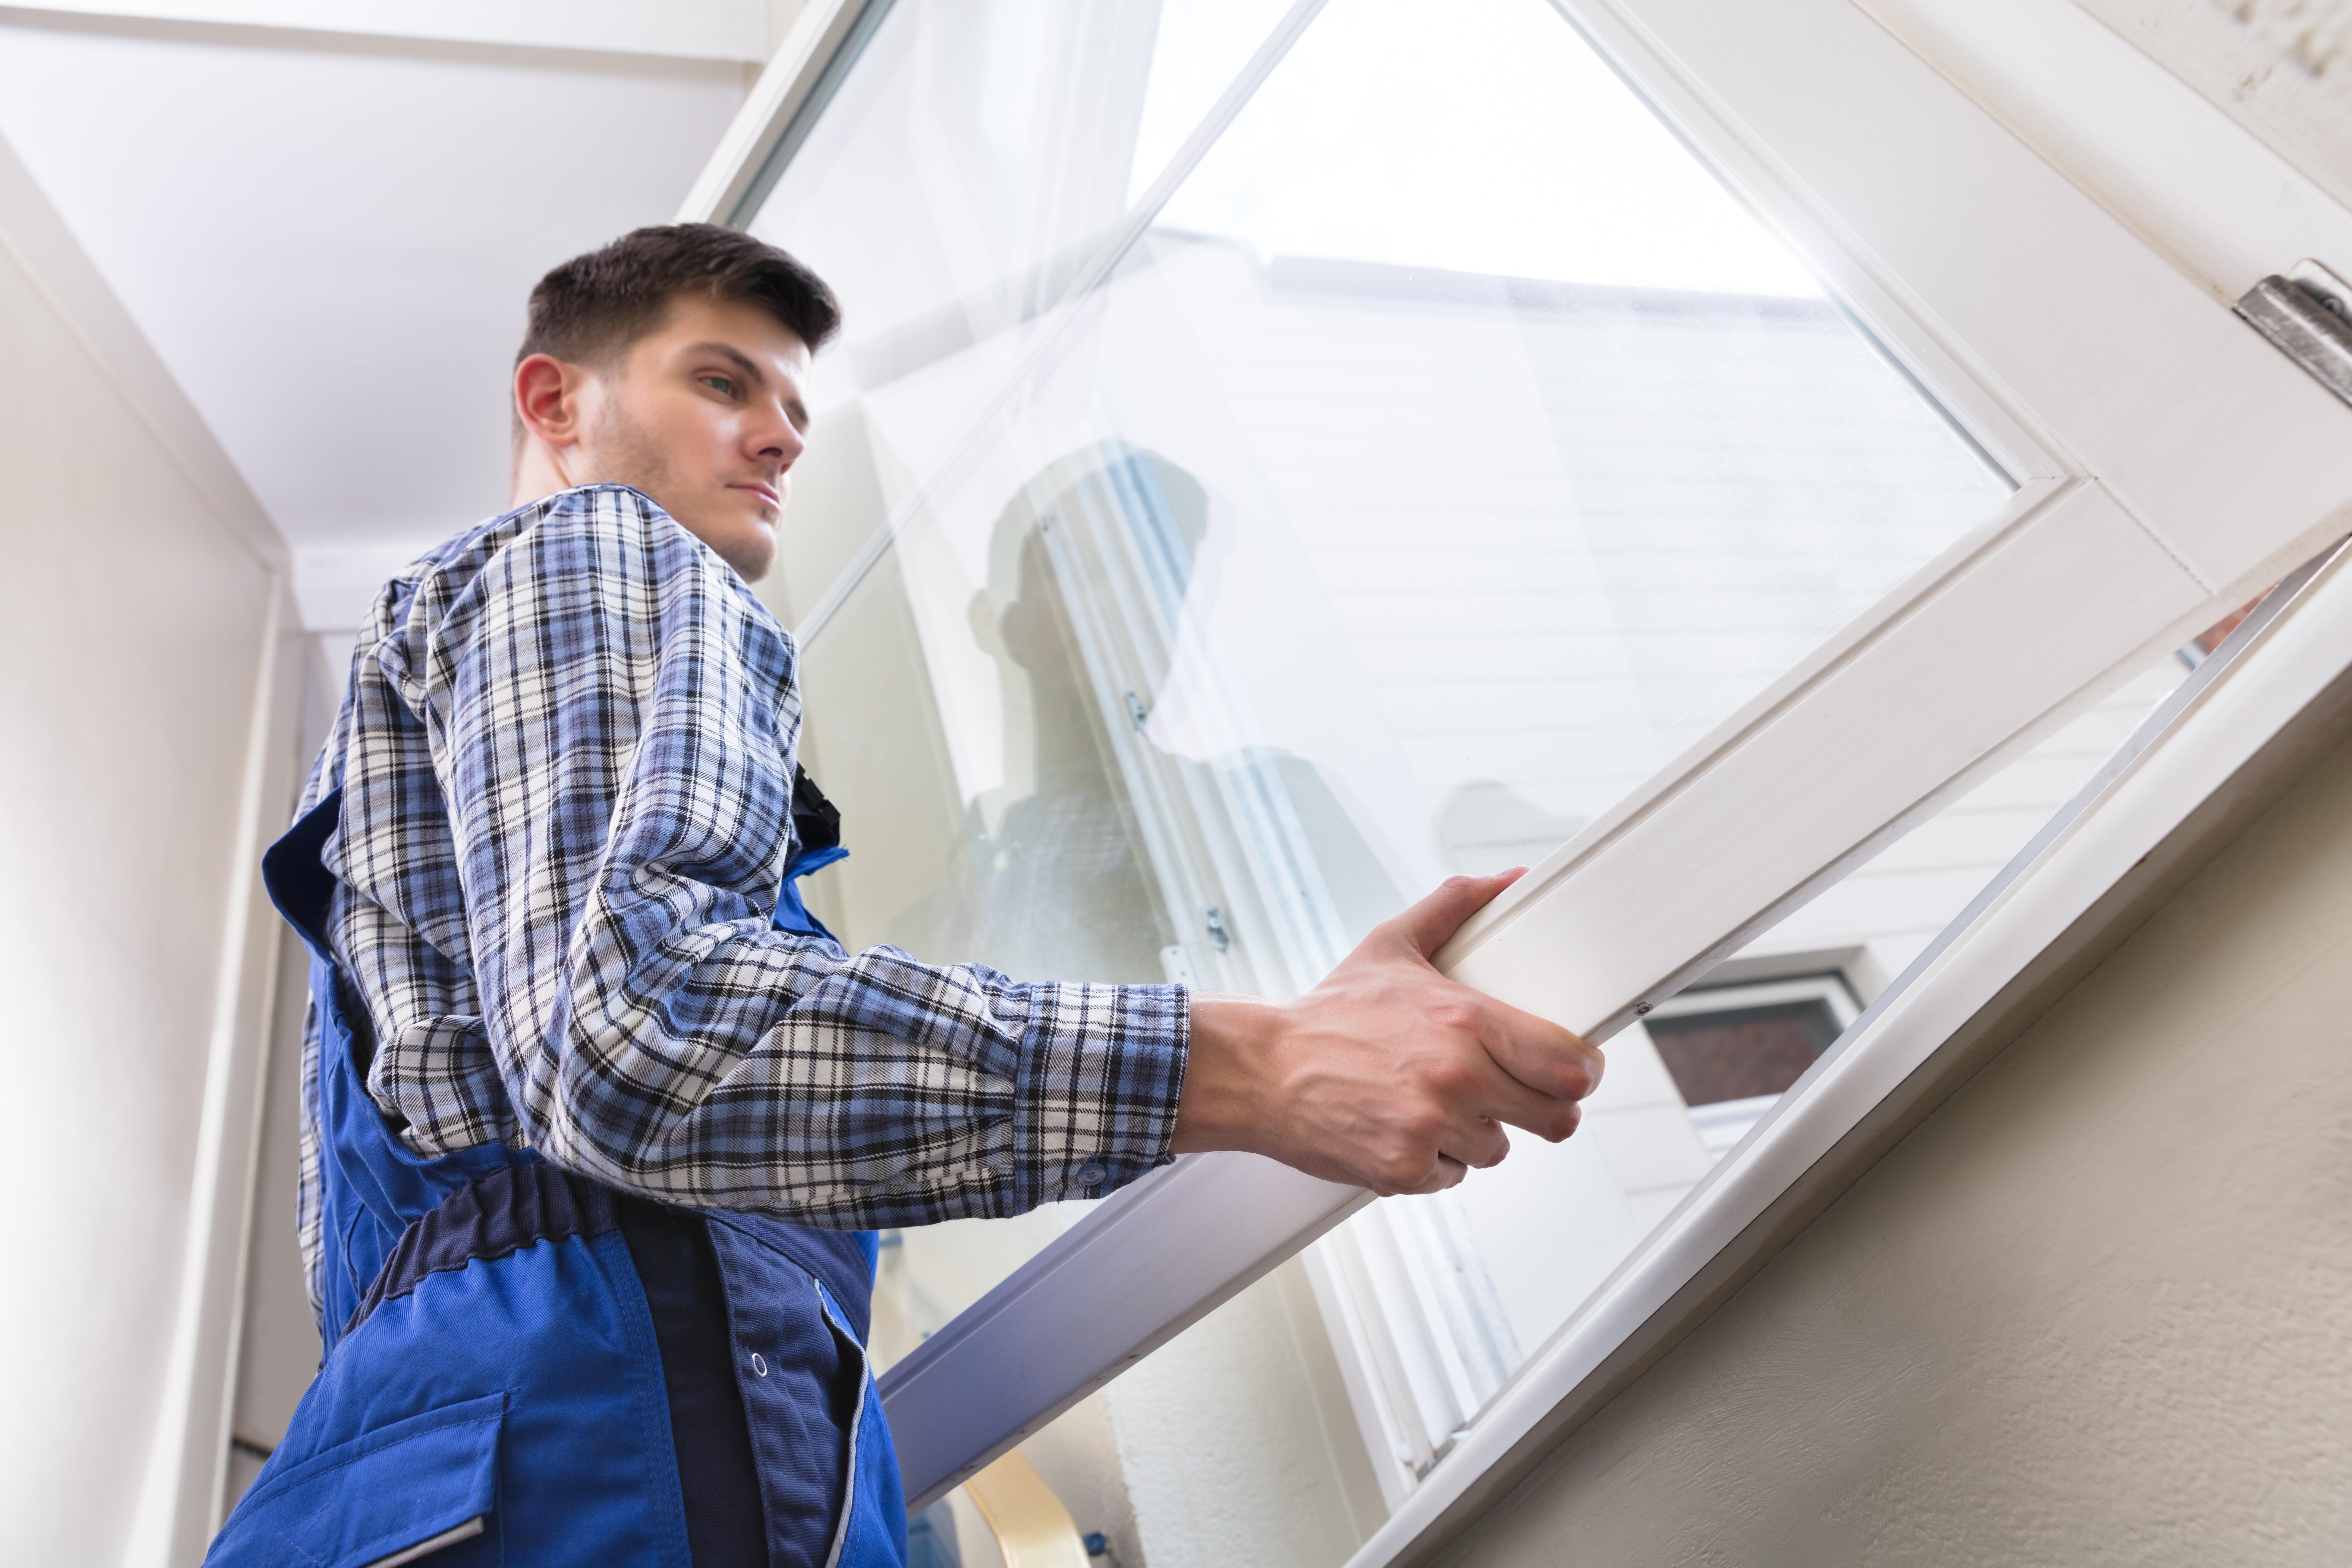 Male Repairman Installing Window